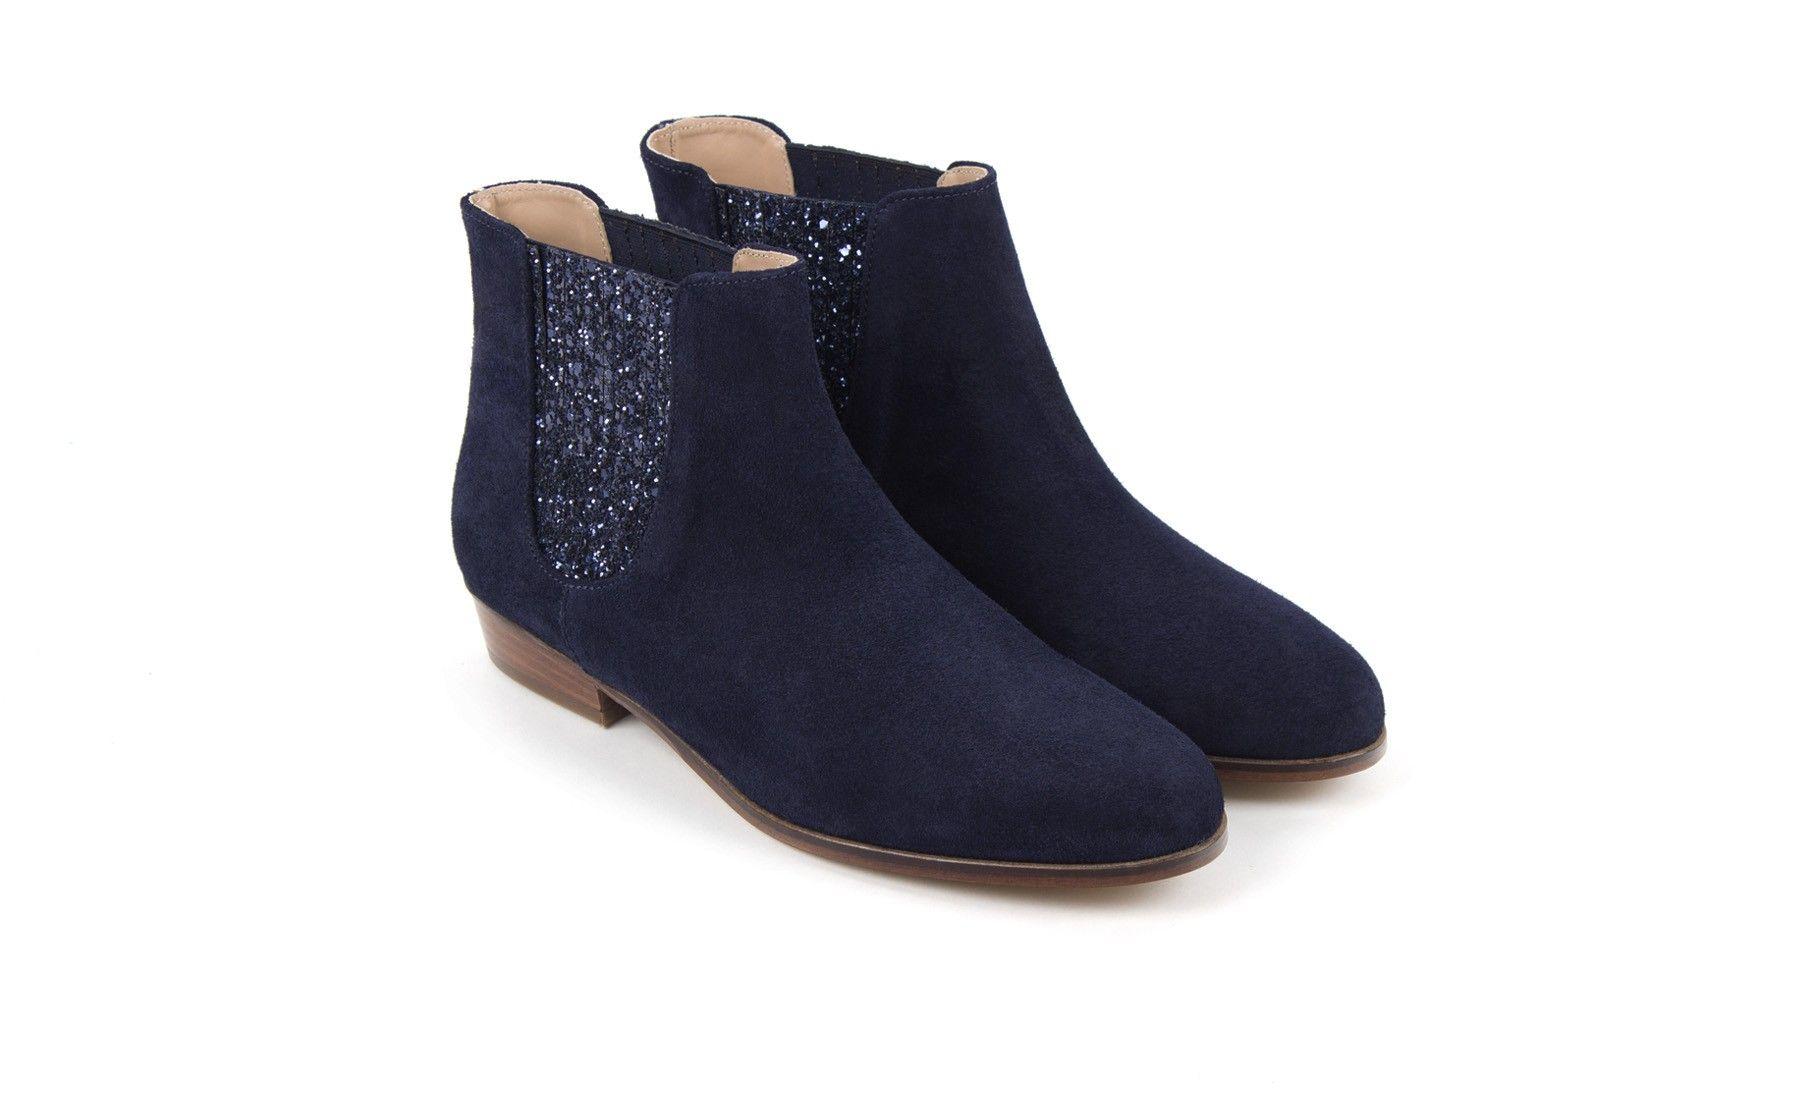 bleu BobbiesWishlist Feerique boots La Chelsea marine VSUGqzMp